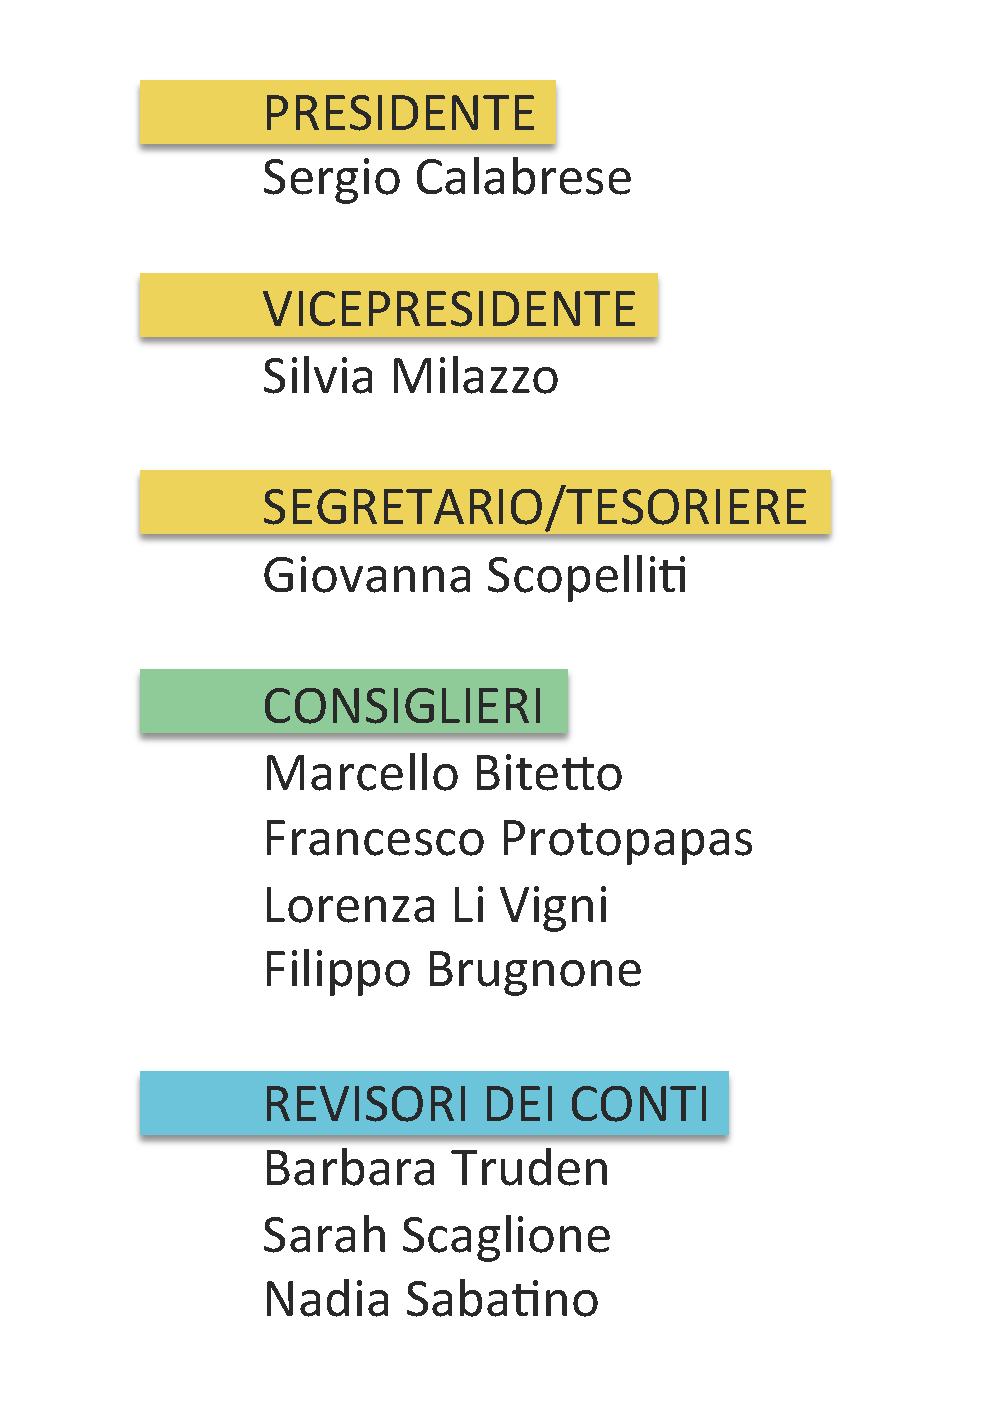 organigramma 2016